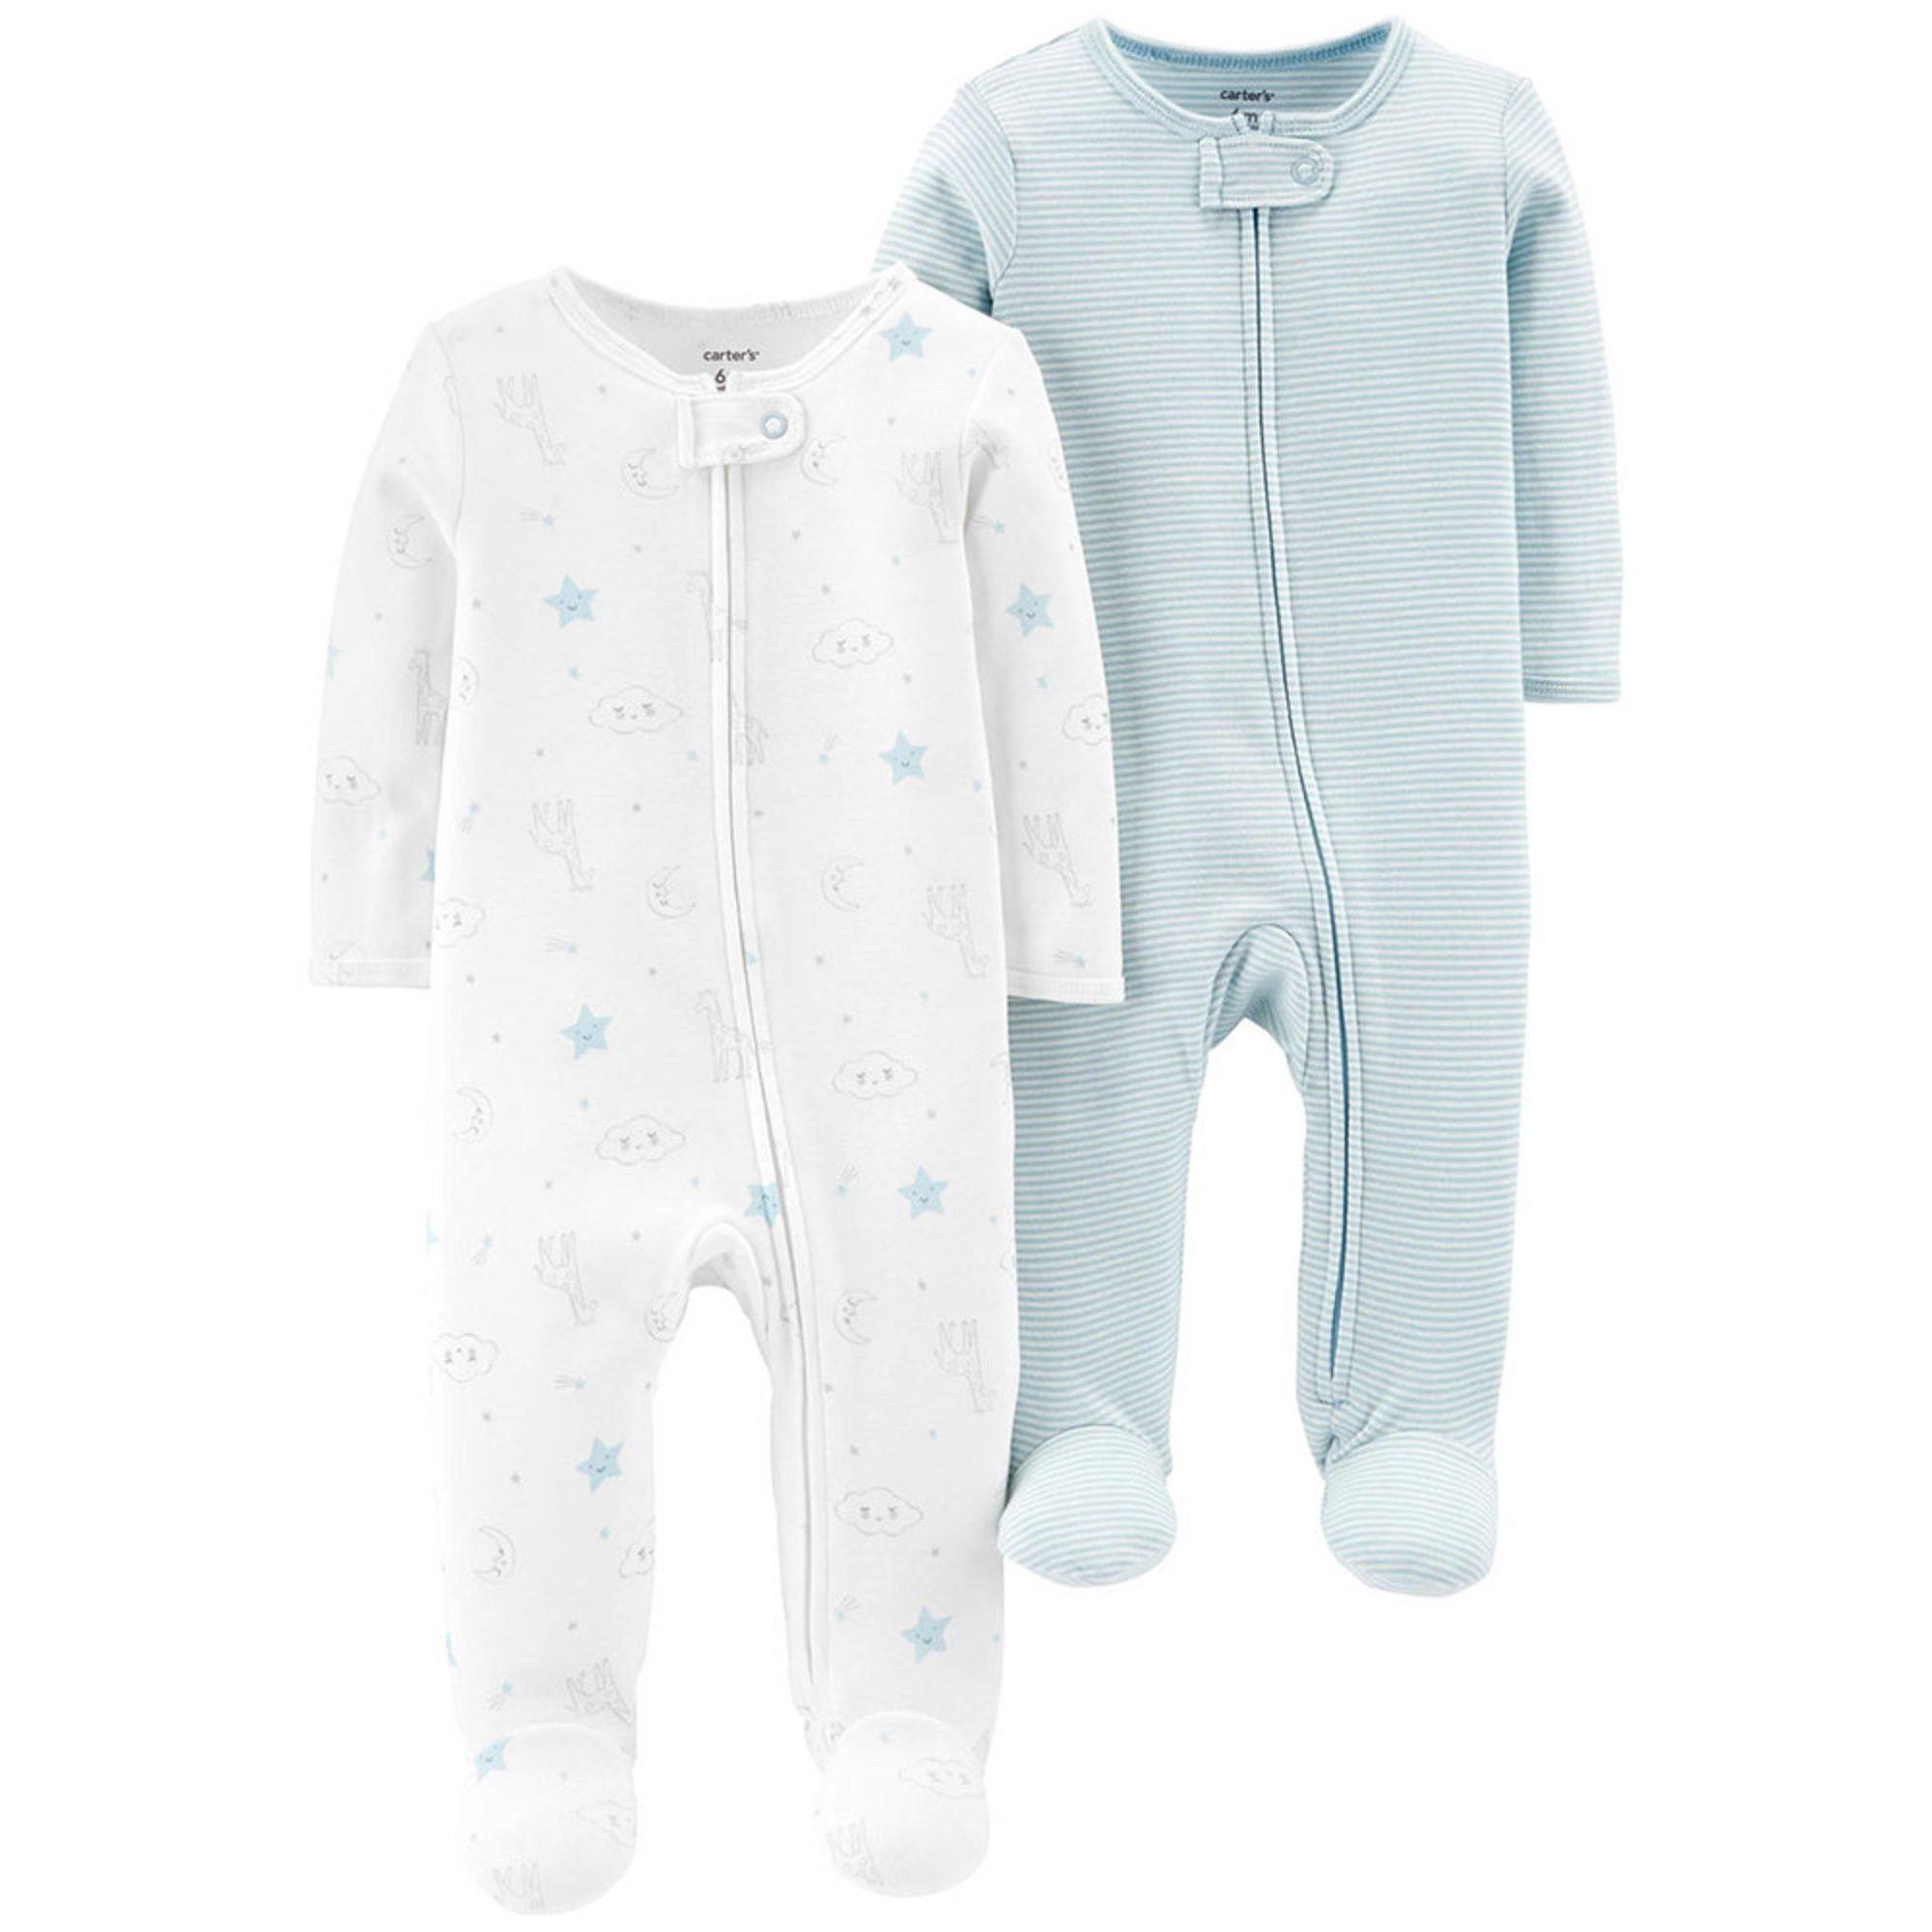 715e60809ddd Carter's Baby Girls' 2-piece Sleep N' Play Set | Baby Girls' Sets ...